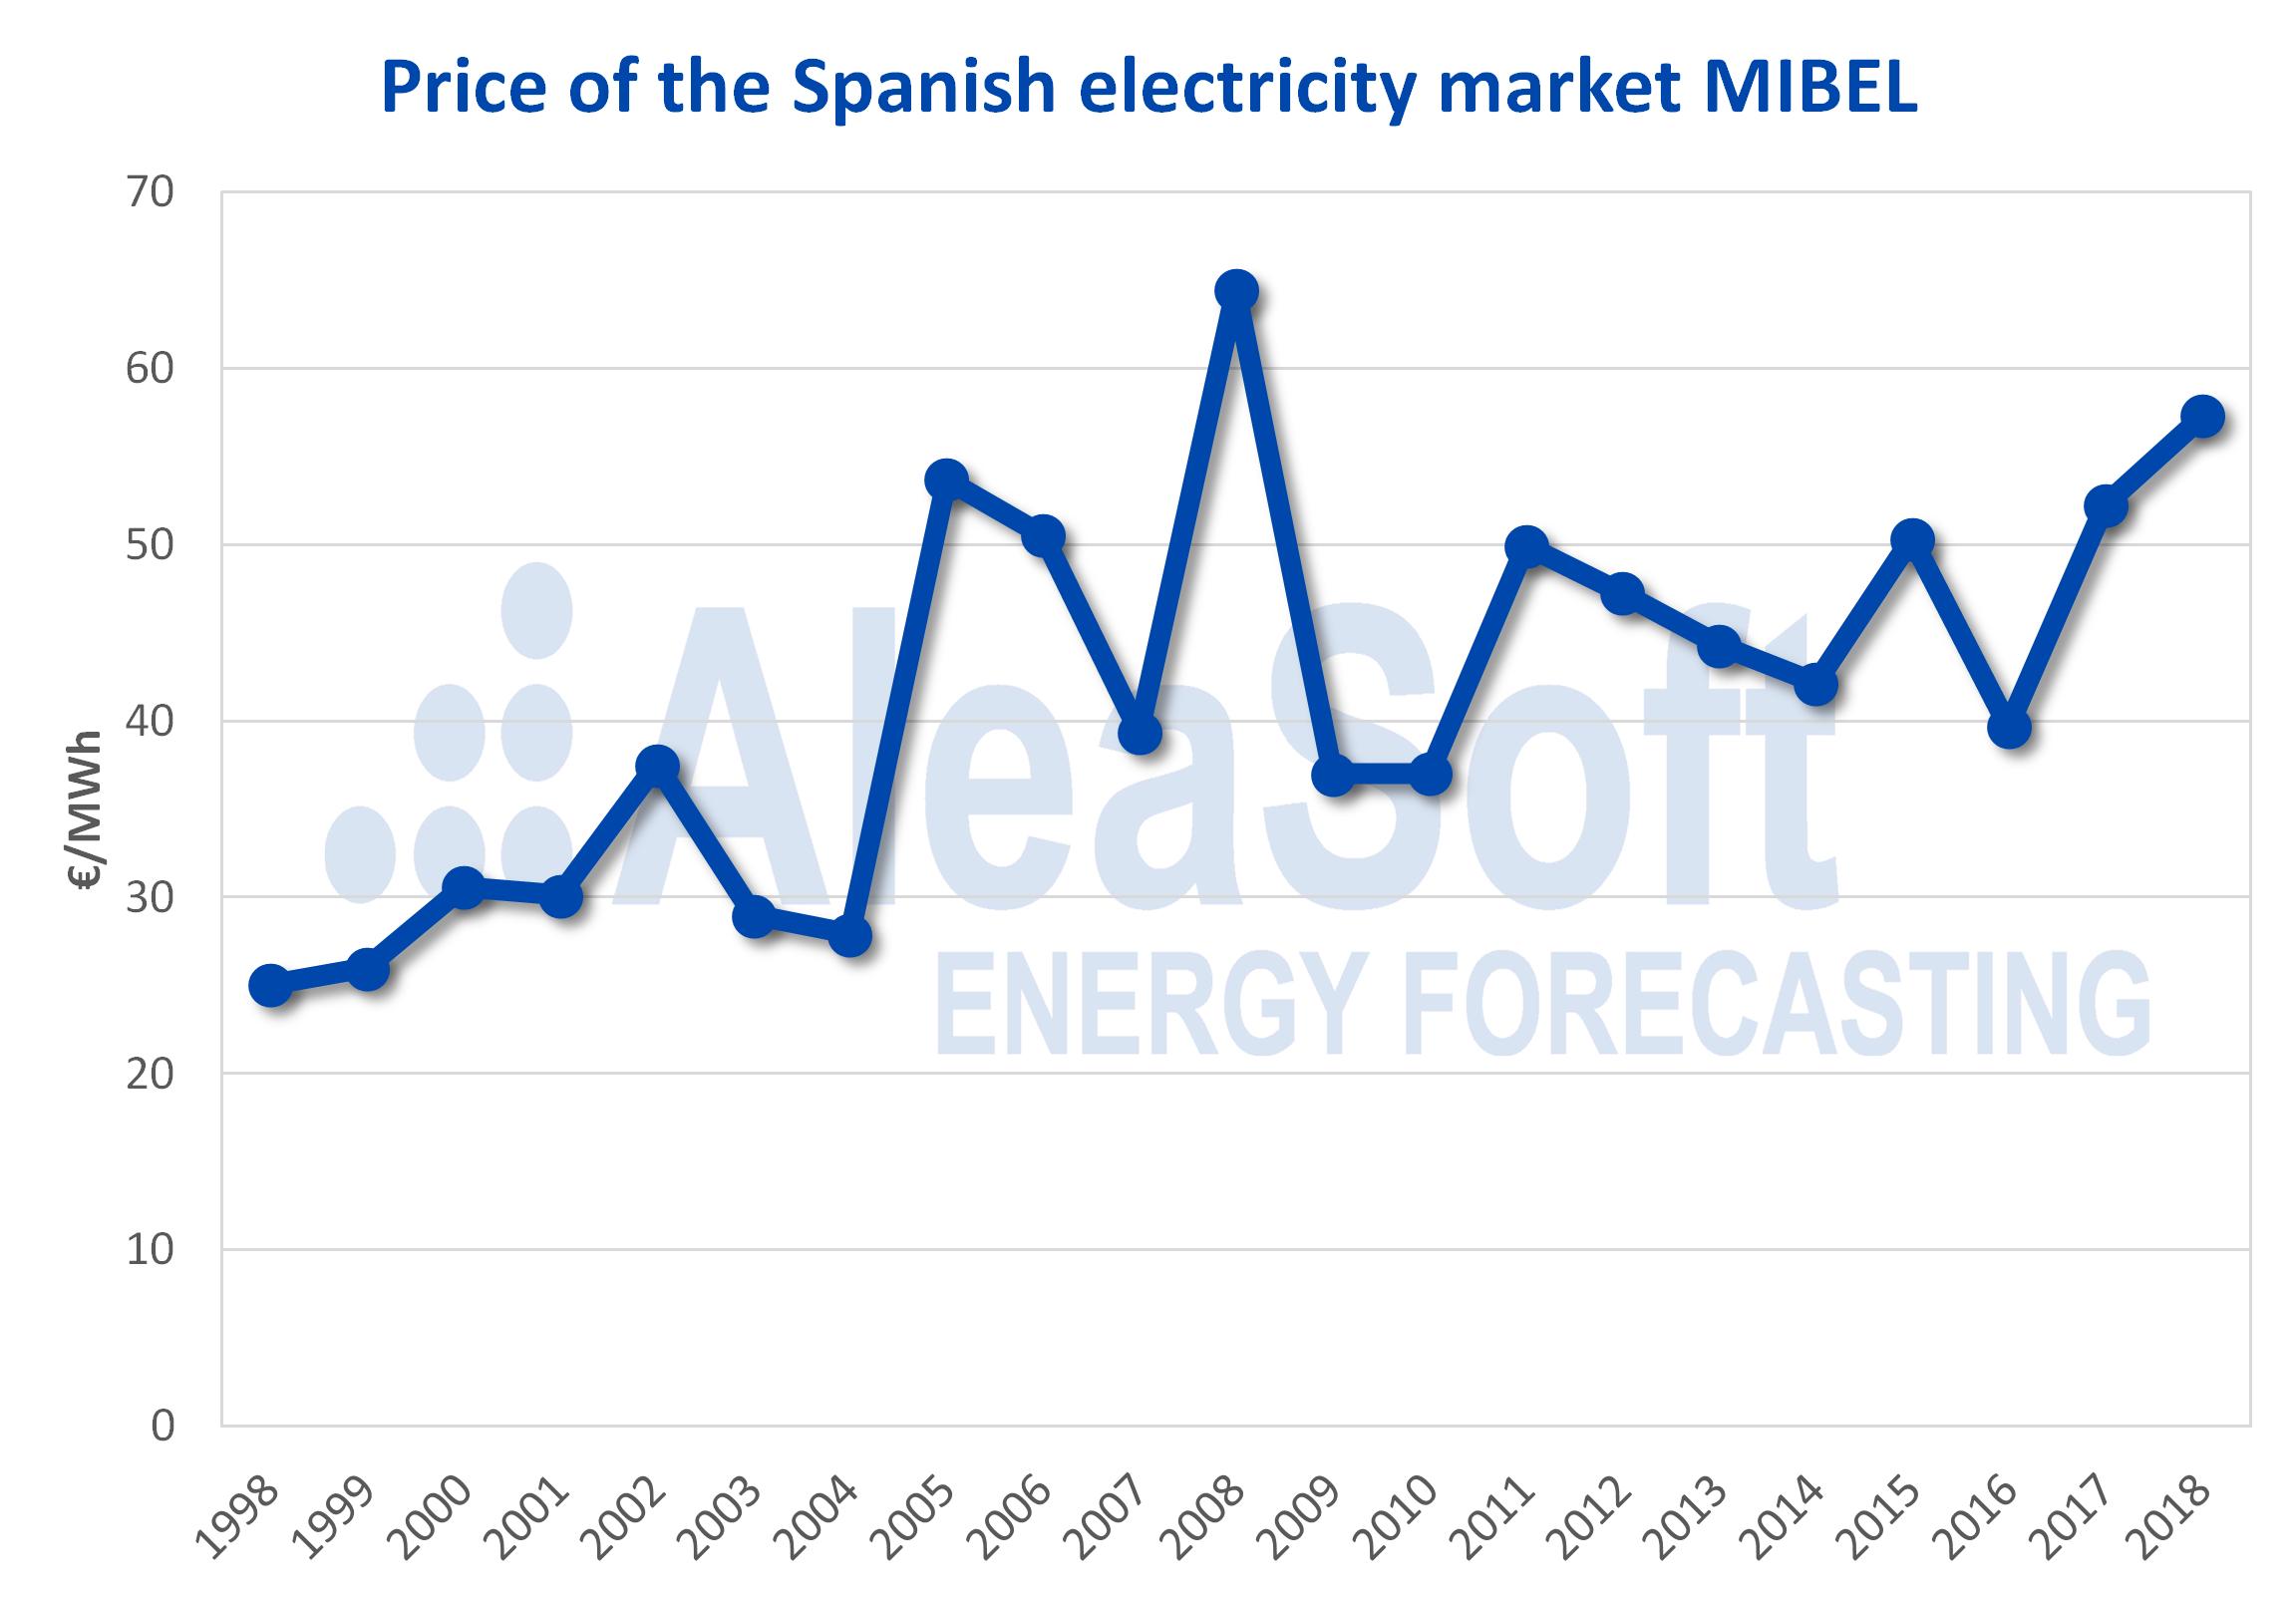 AleaSoft - Mean annual price Spanish electricity market MIBEL